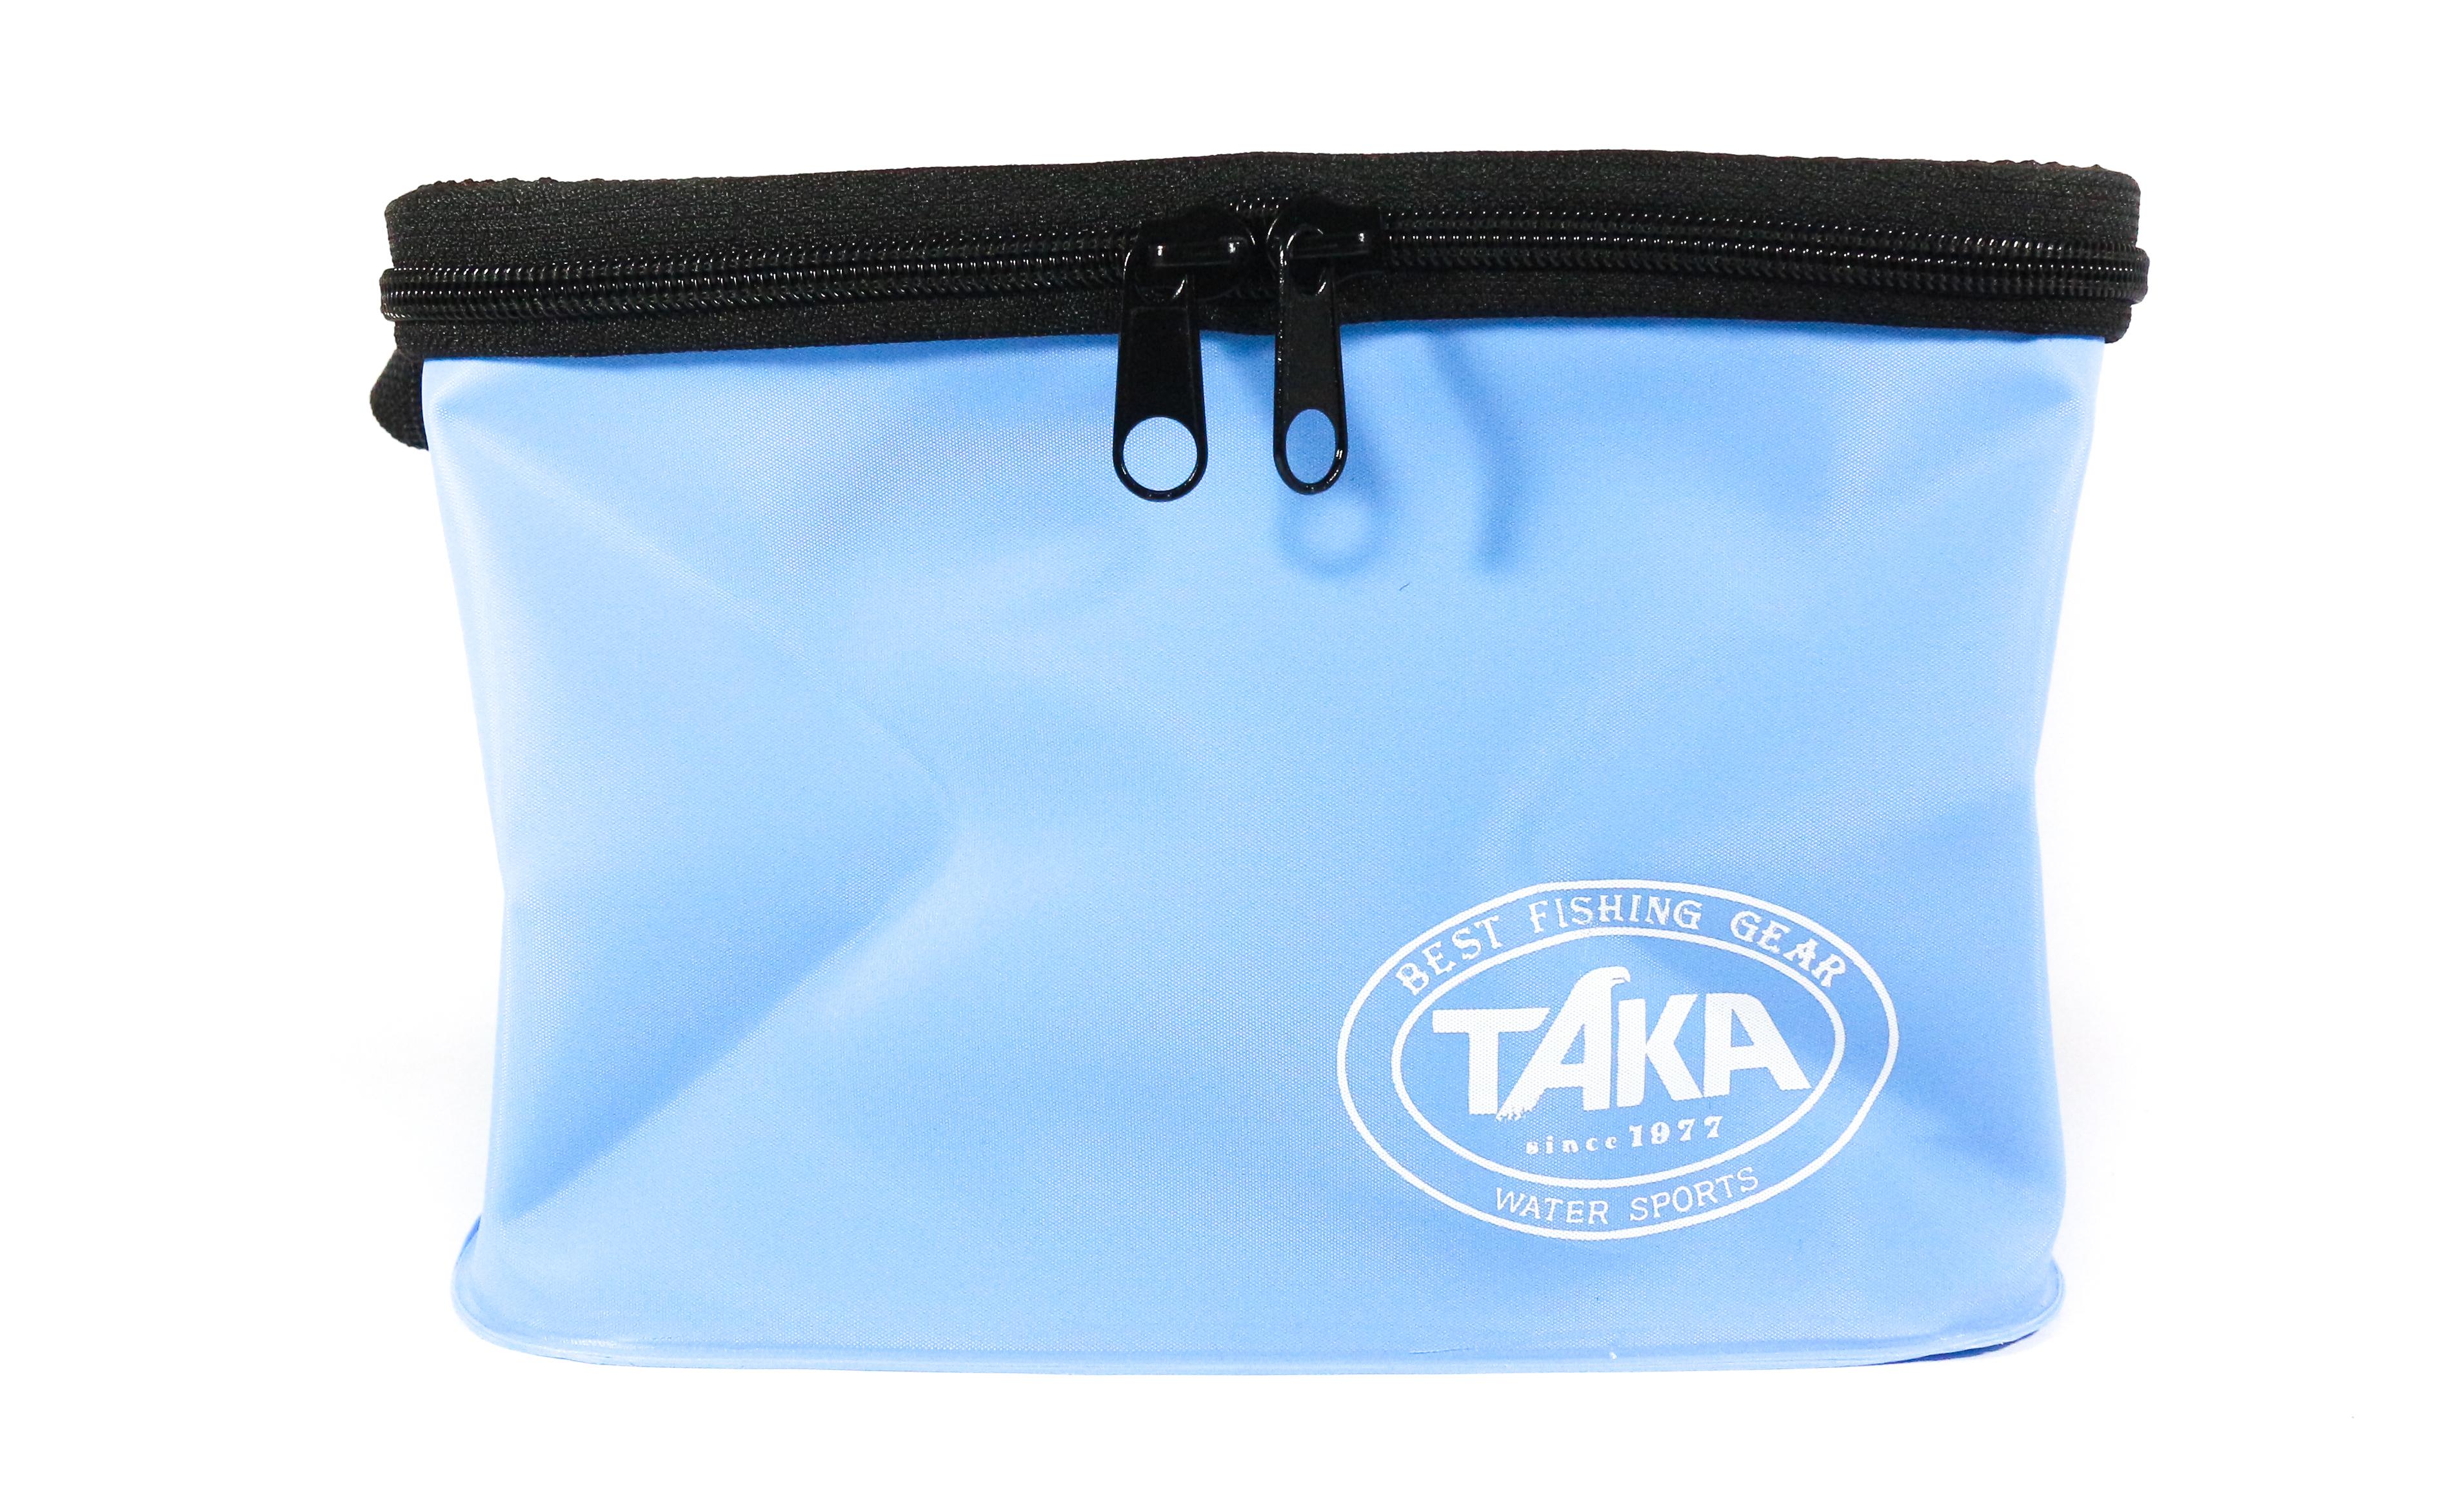 Taka 722 Bakan Bag Foldable Box 24 x 15.5 x 16.5 mm Blue (0383)